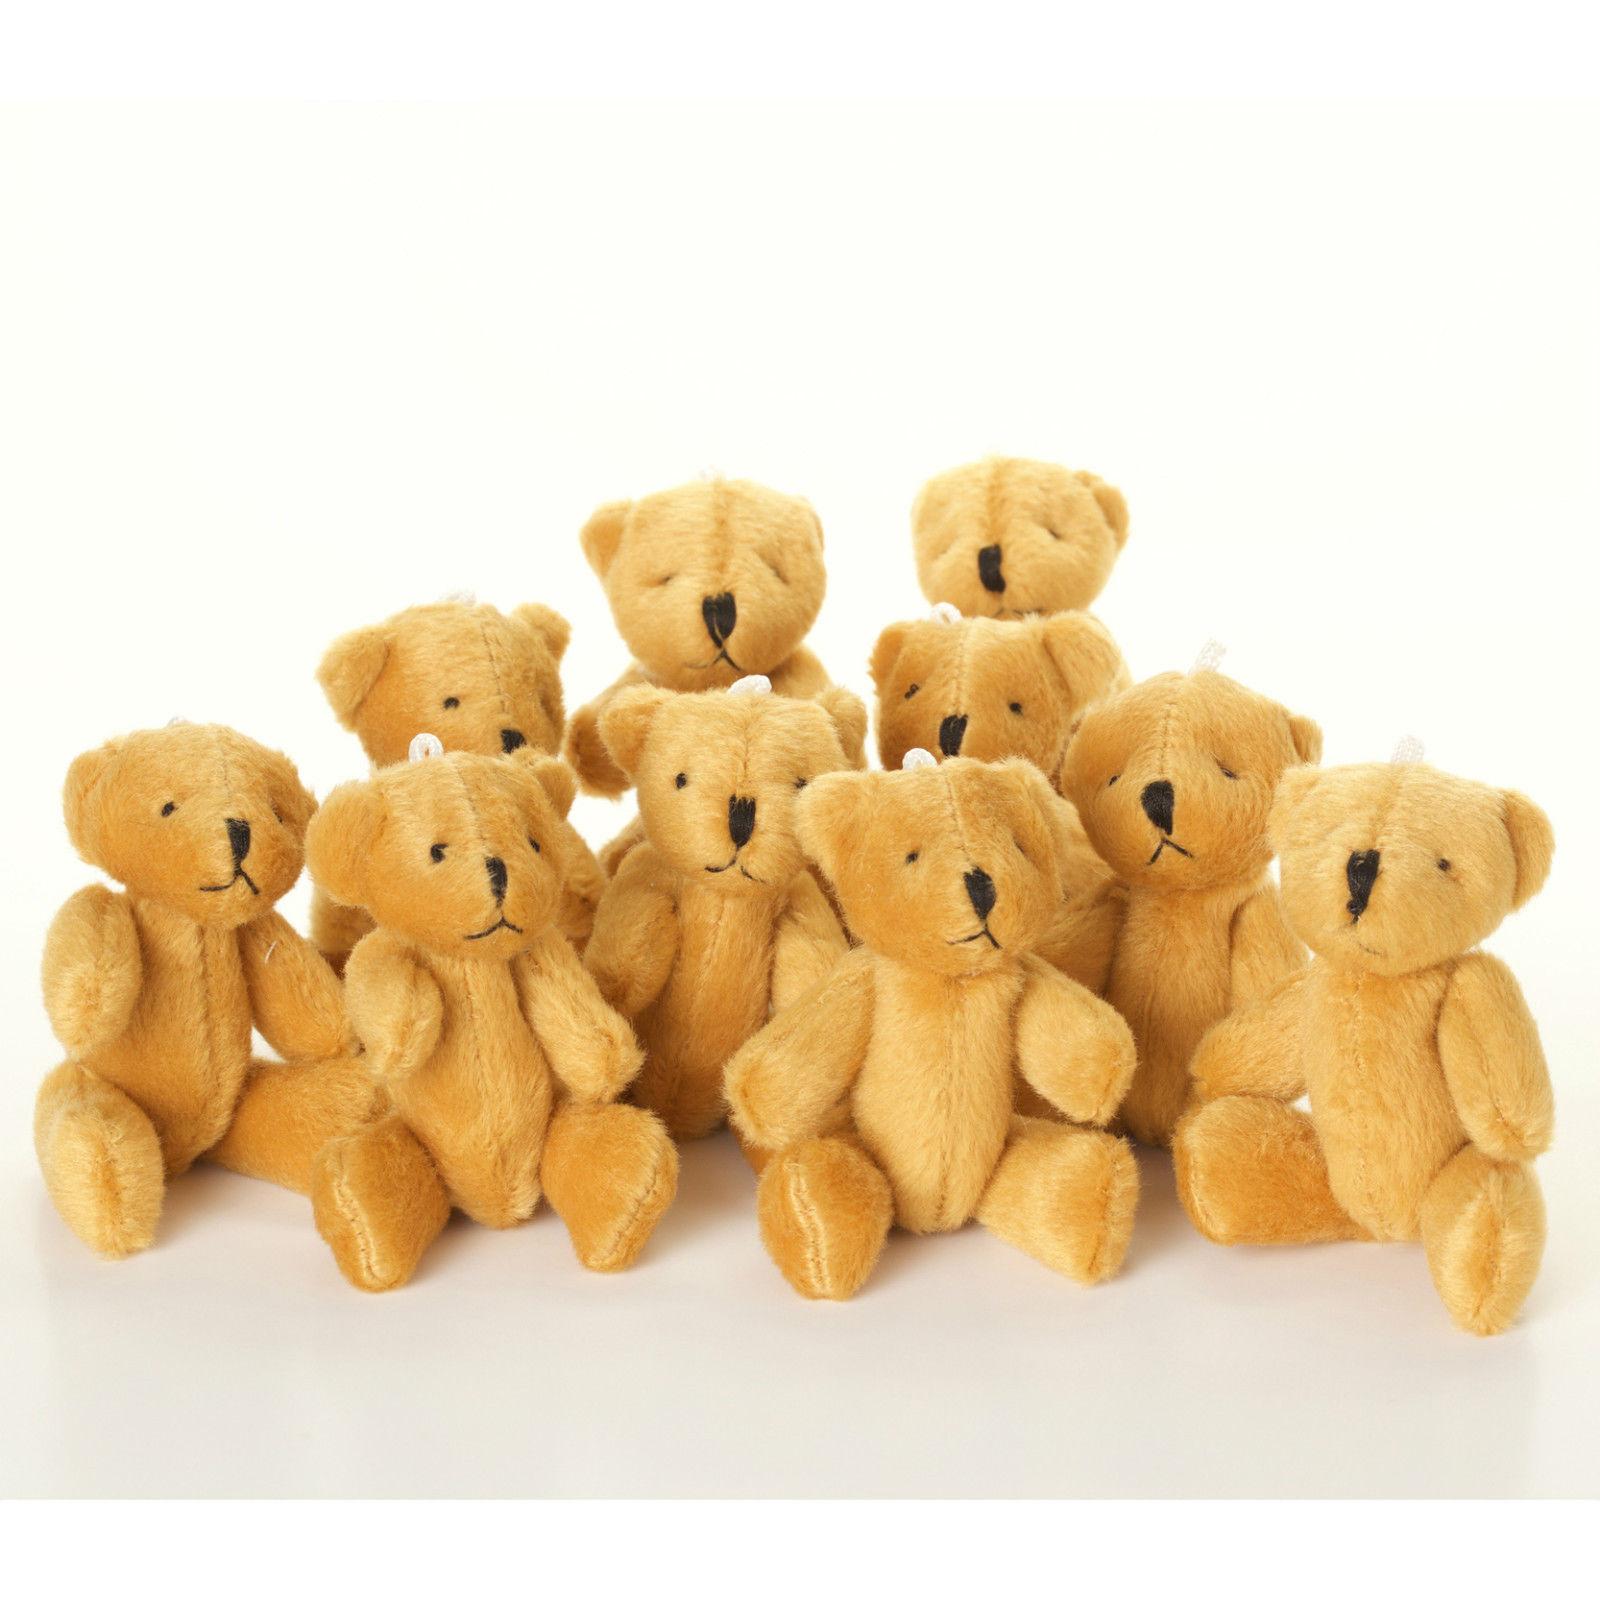 New Brown Teddy Bears Small Cute And Cuddly Gift Present Birthday Xmas Small Teddy Bears Teddy Bear Gifts Teddy Bear Stuffed Animal [ 1600 x 1600 Pixel ]